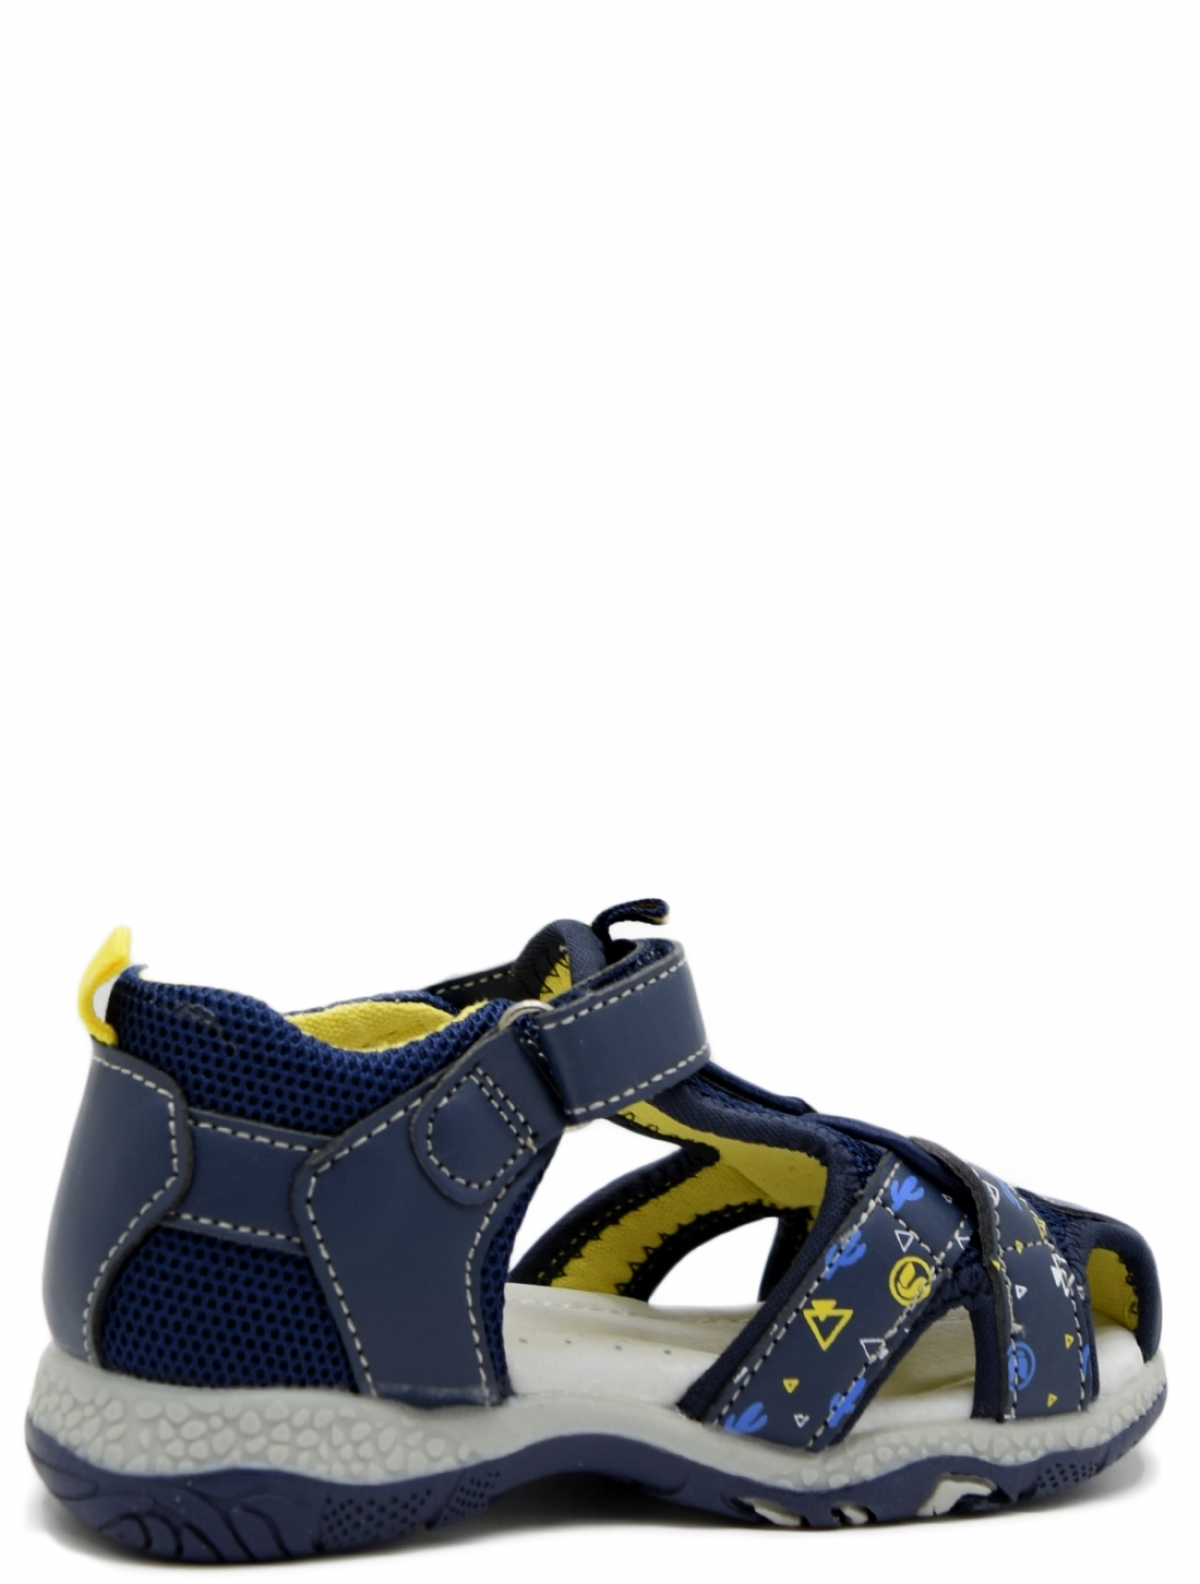 Ulet HS1915-2 сандали для мальчика